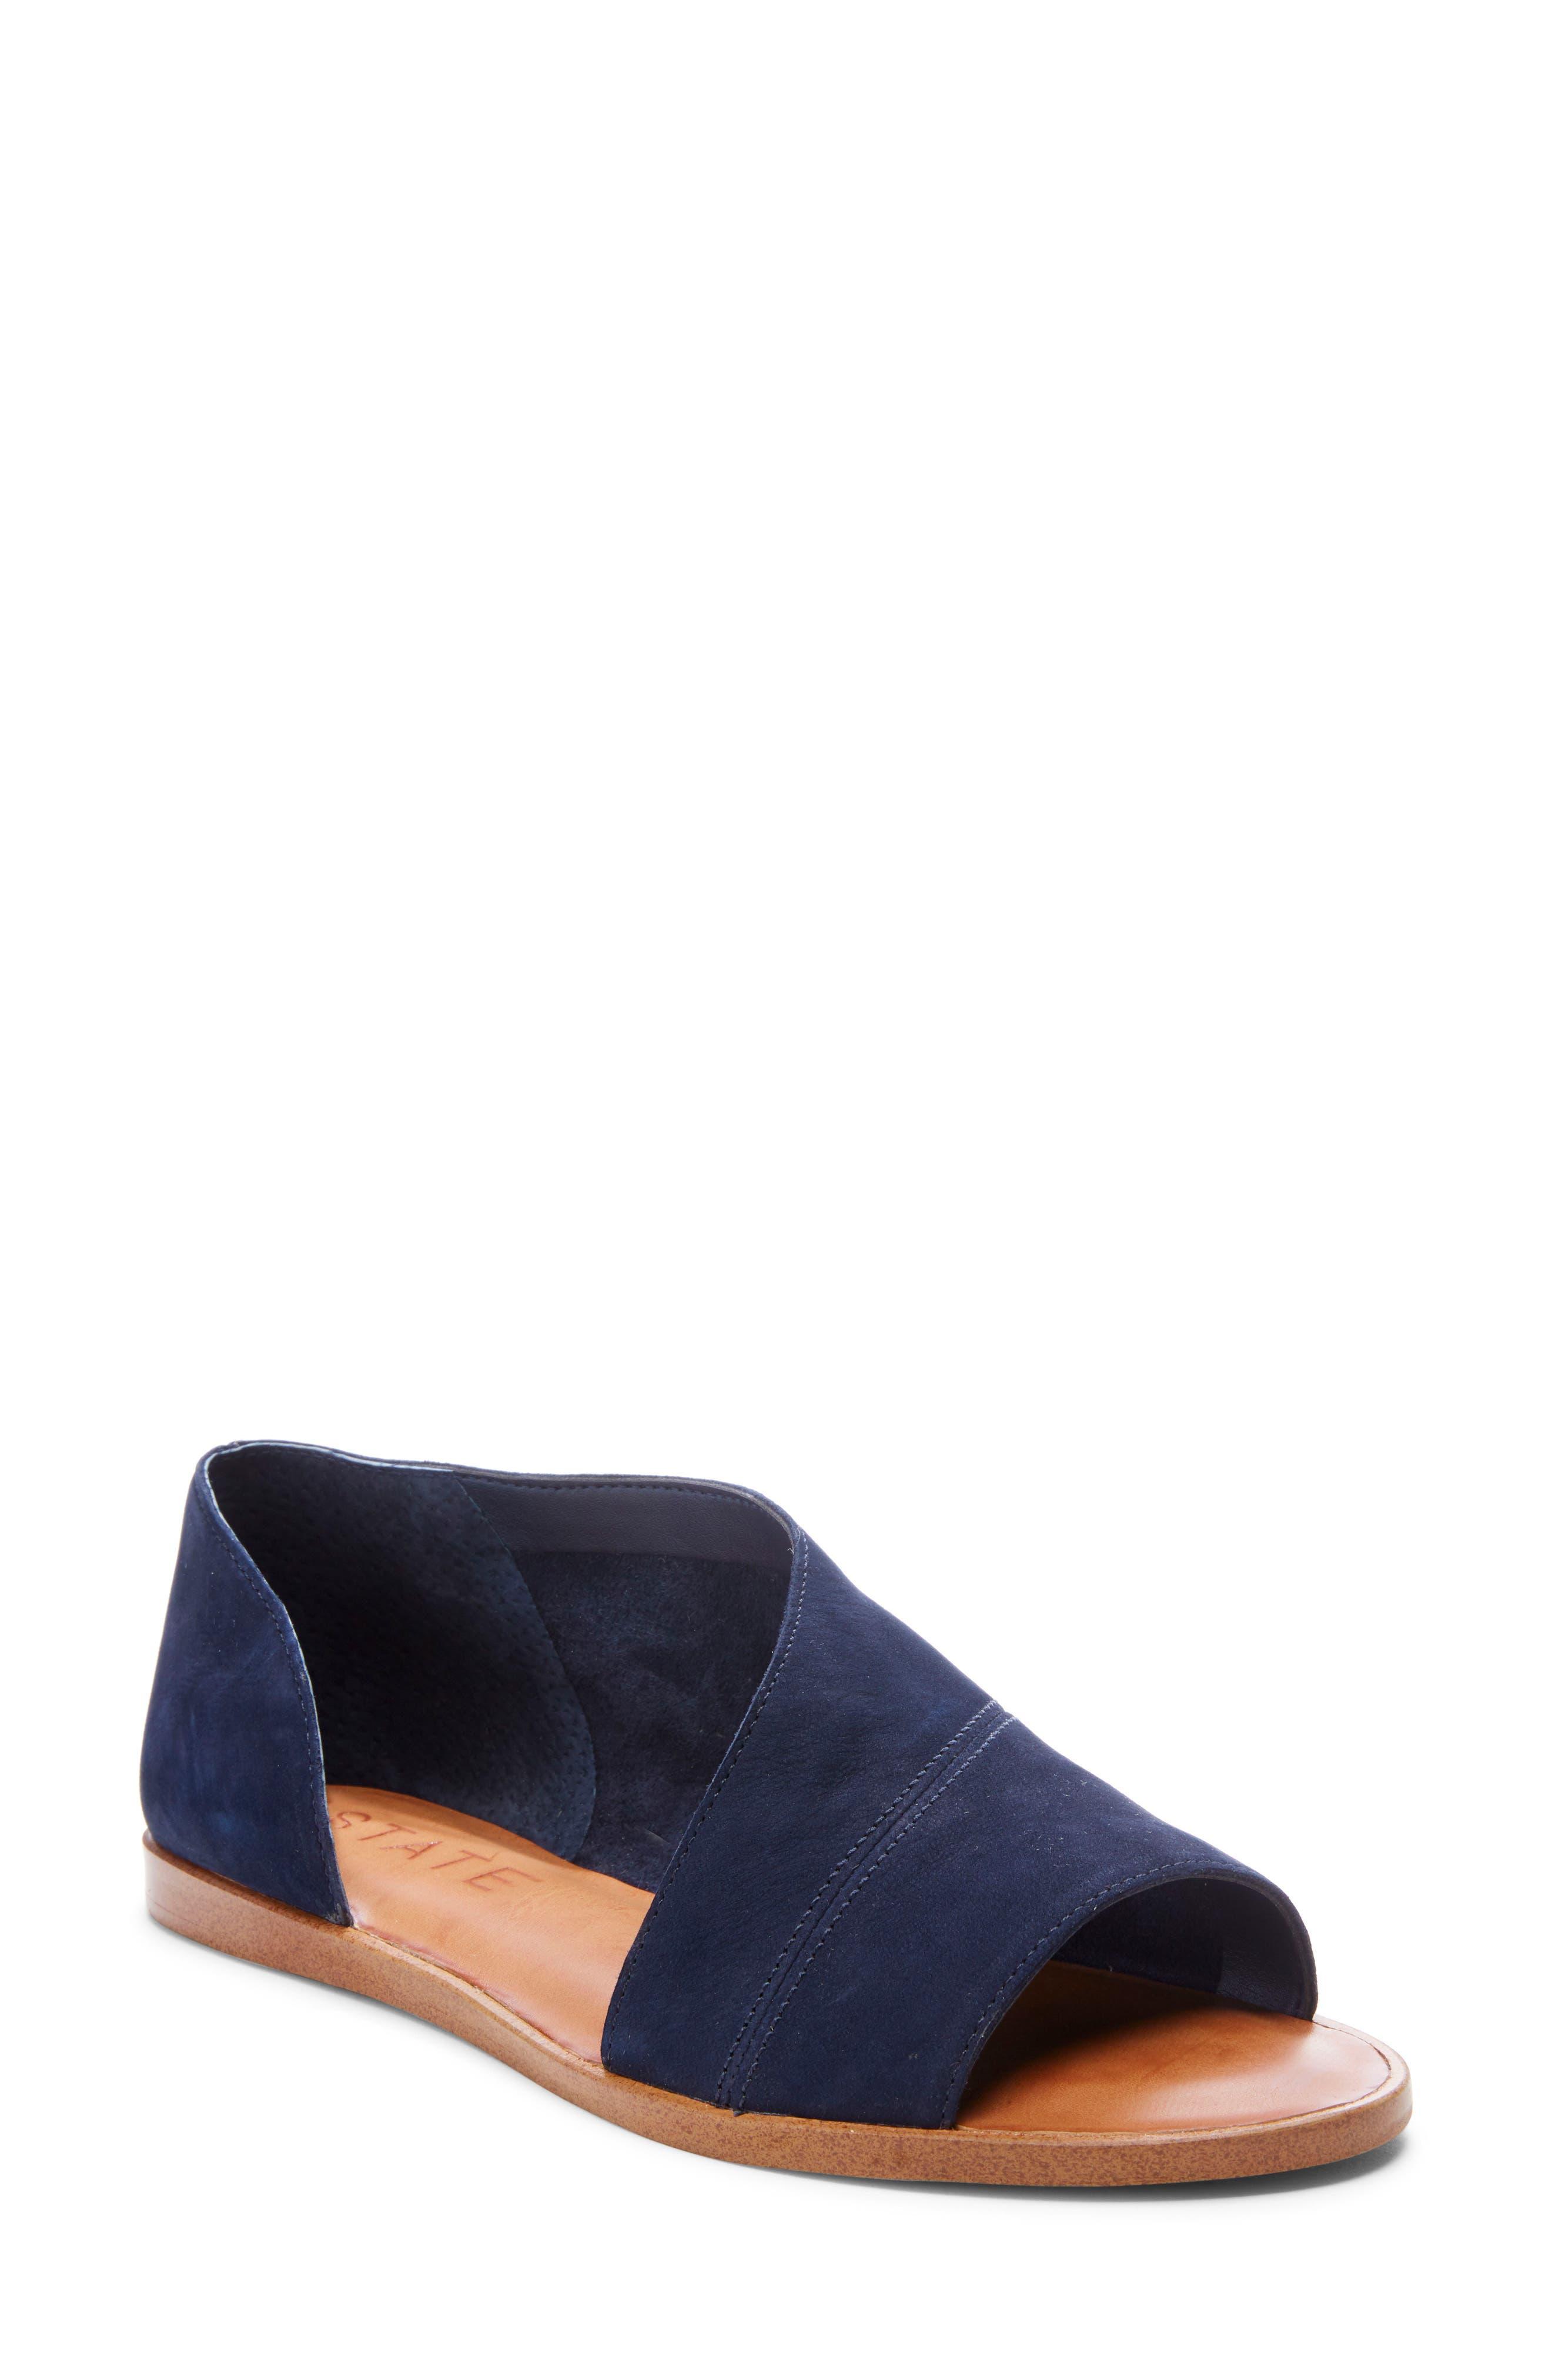 e4c53a9a8fc687 Women s 1.STATE Shoes